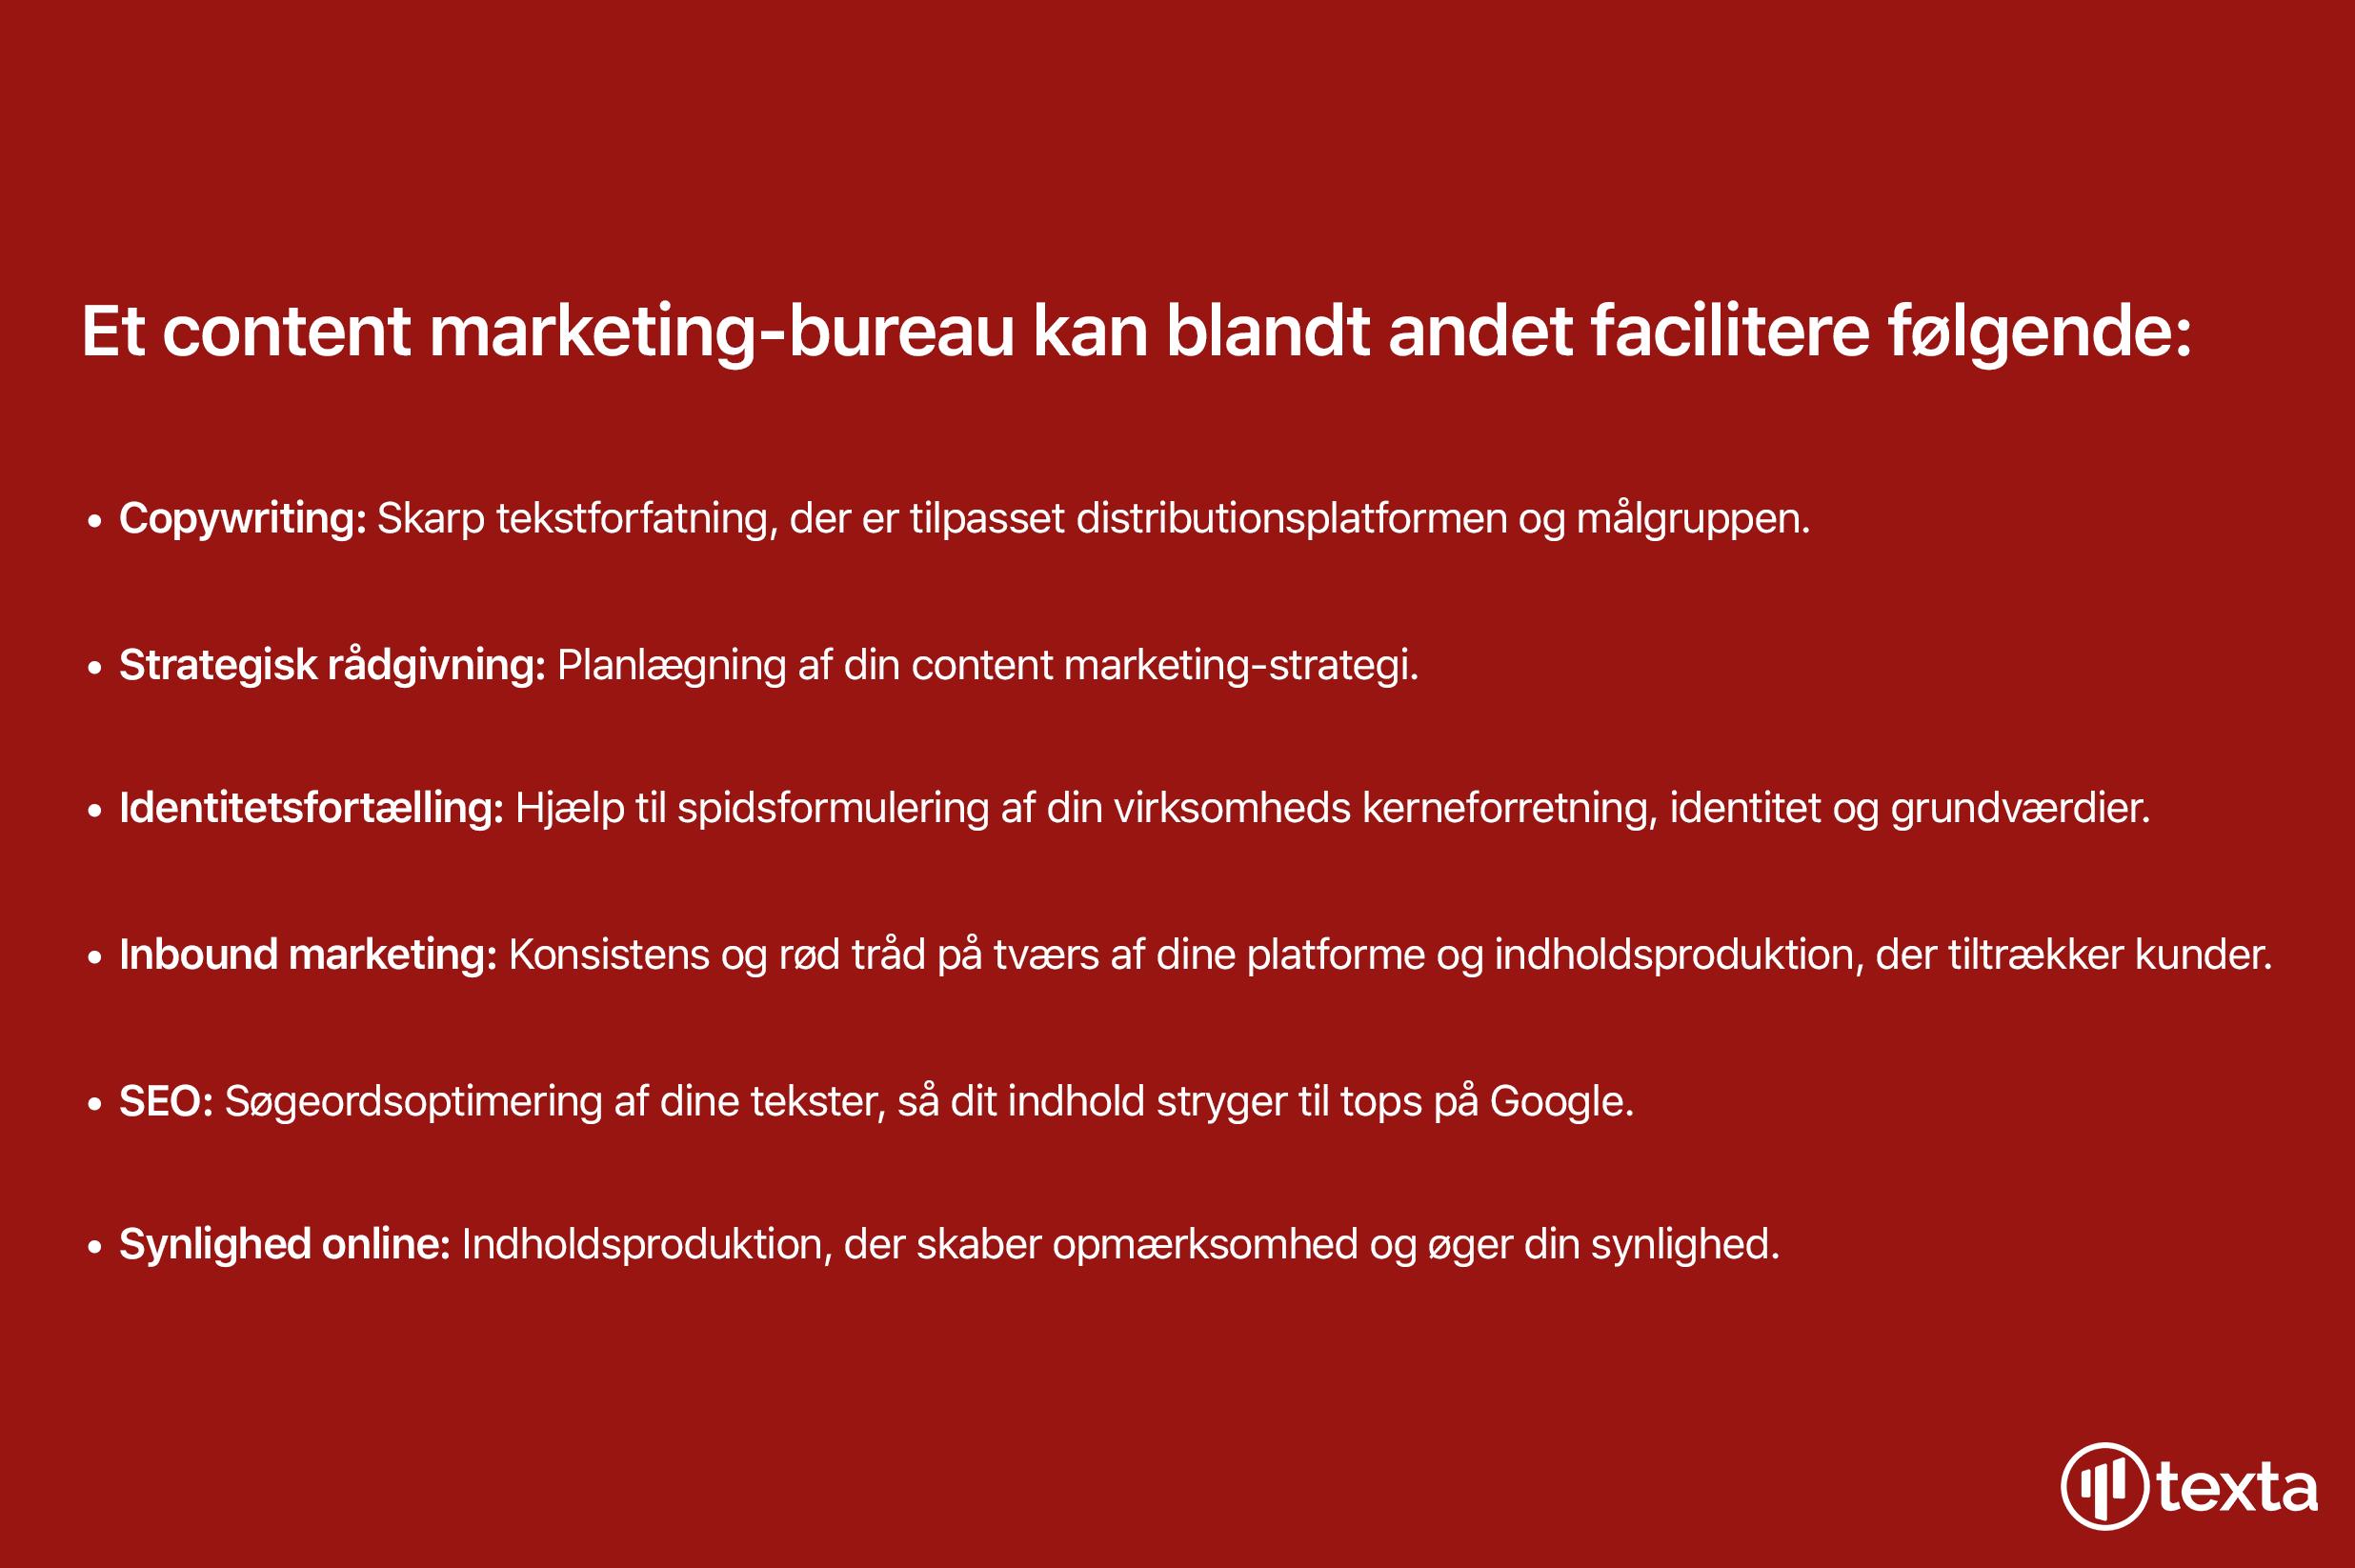 content marketing-bureau facilitere